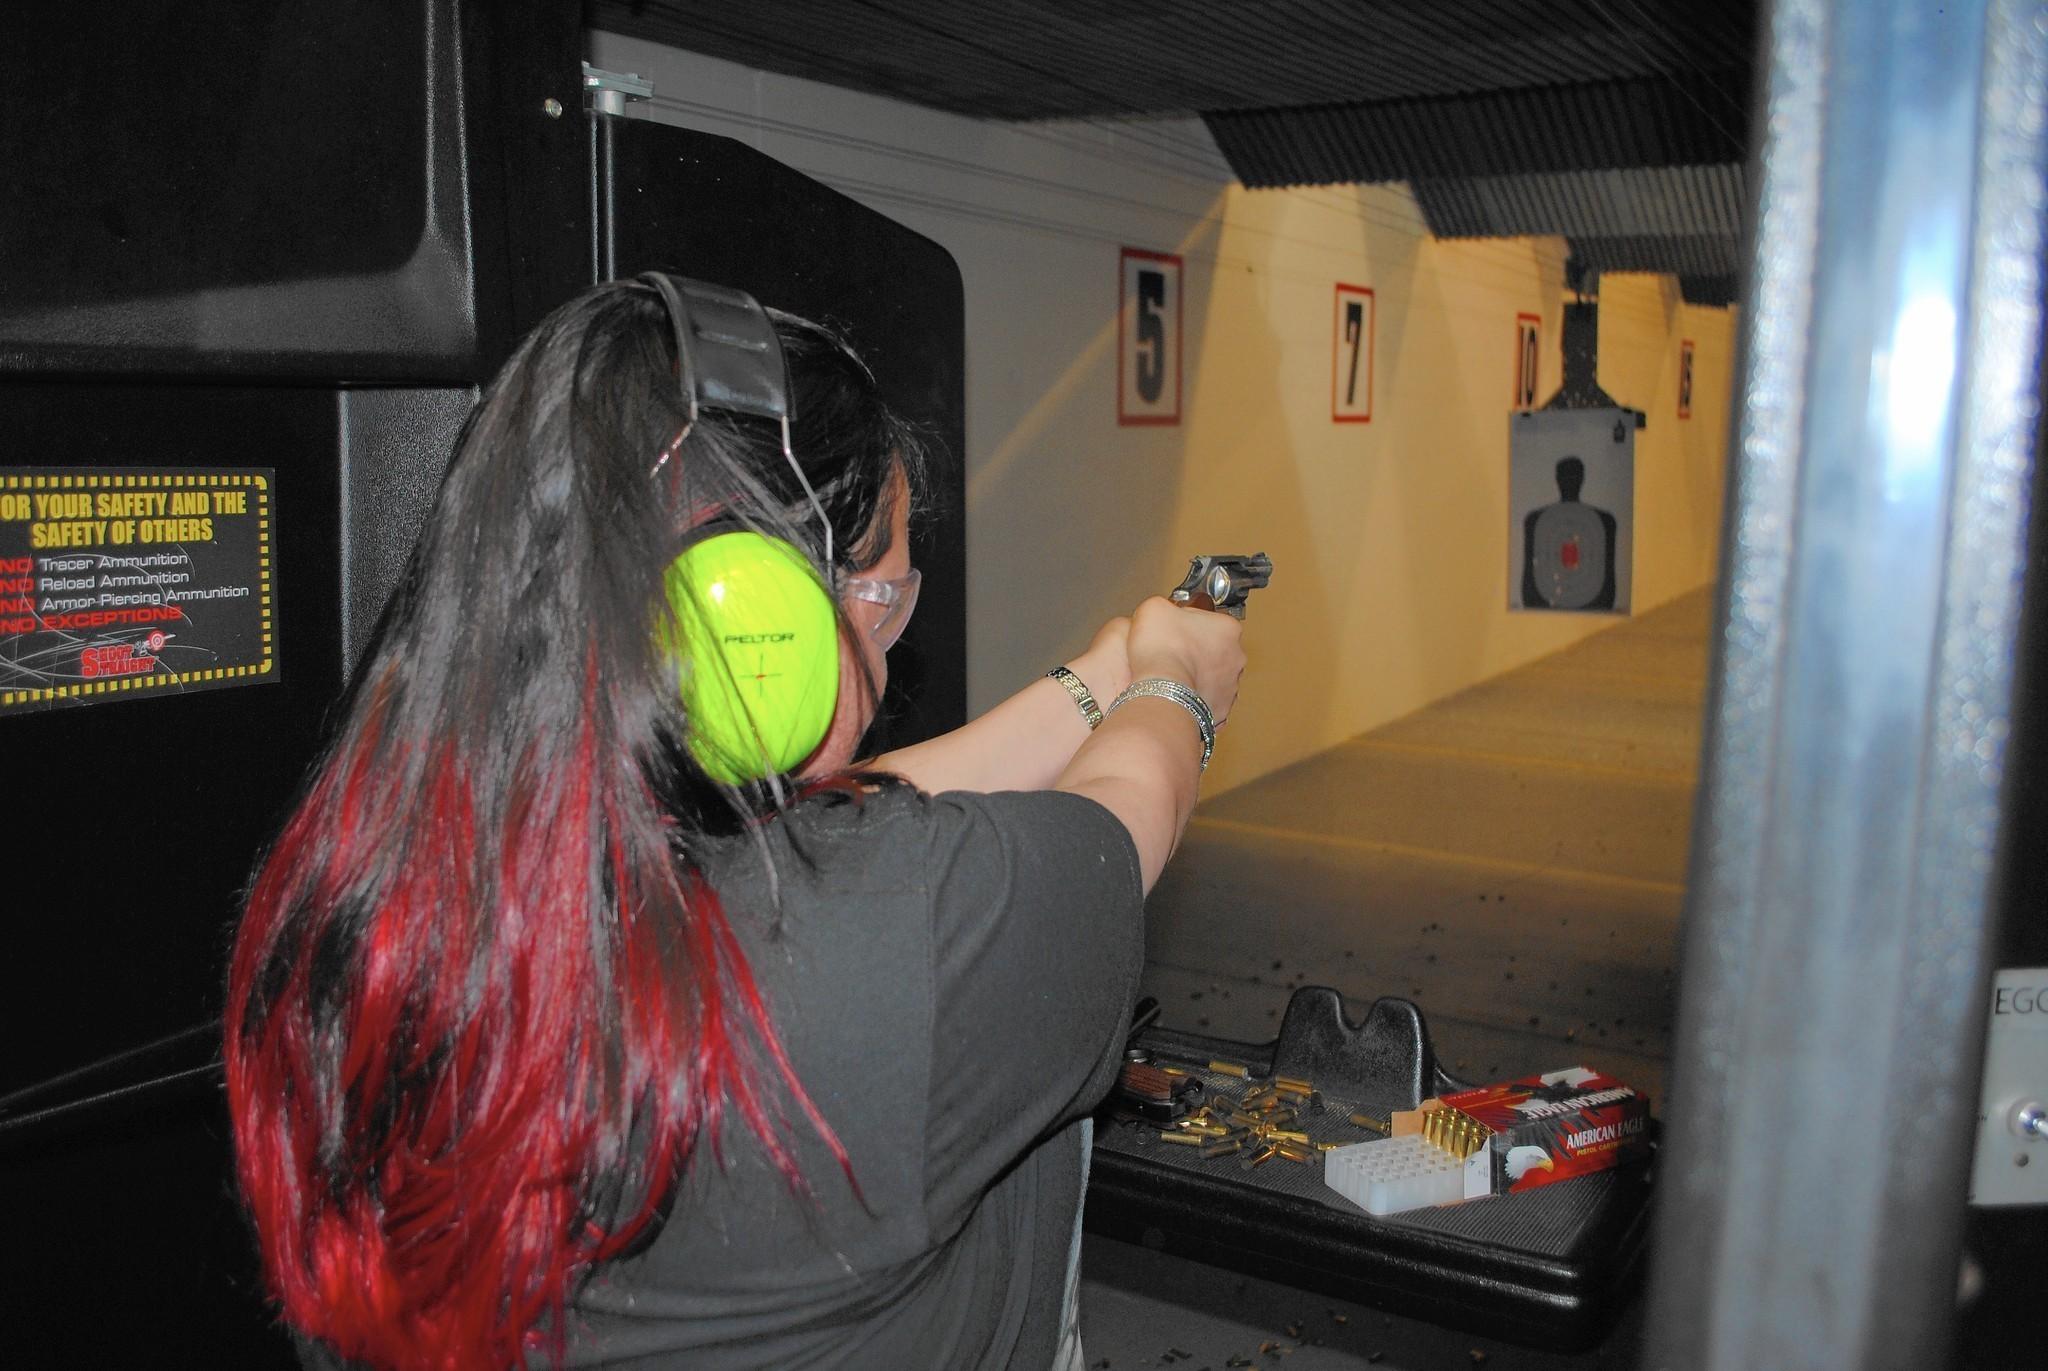 Shooting Range Orlando >> Area gun ranges busy on ladies' nights - Orlando Sentinel